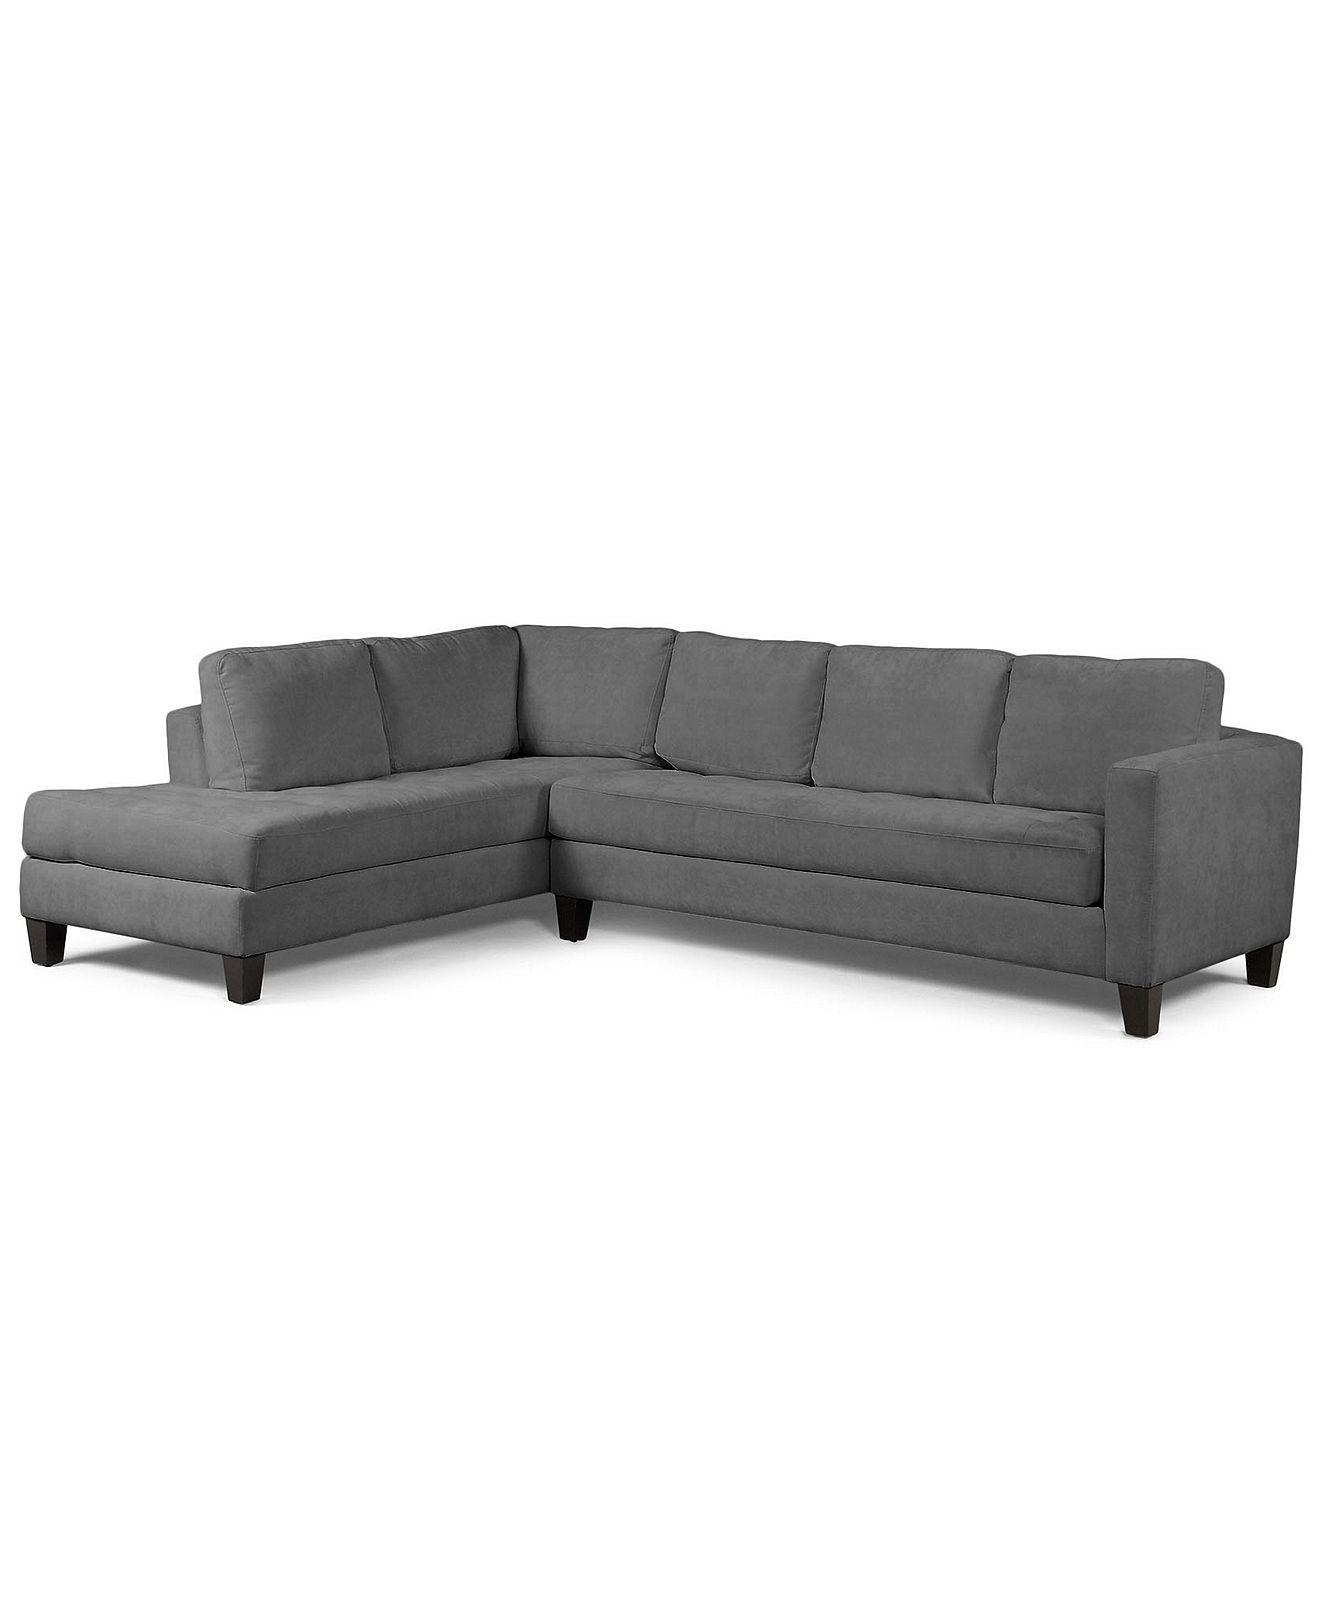 Milo Fabric Microfiber Sectional Sofa 2 Piece Sofa